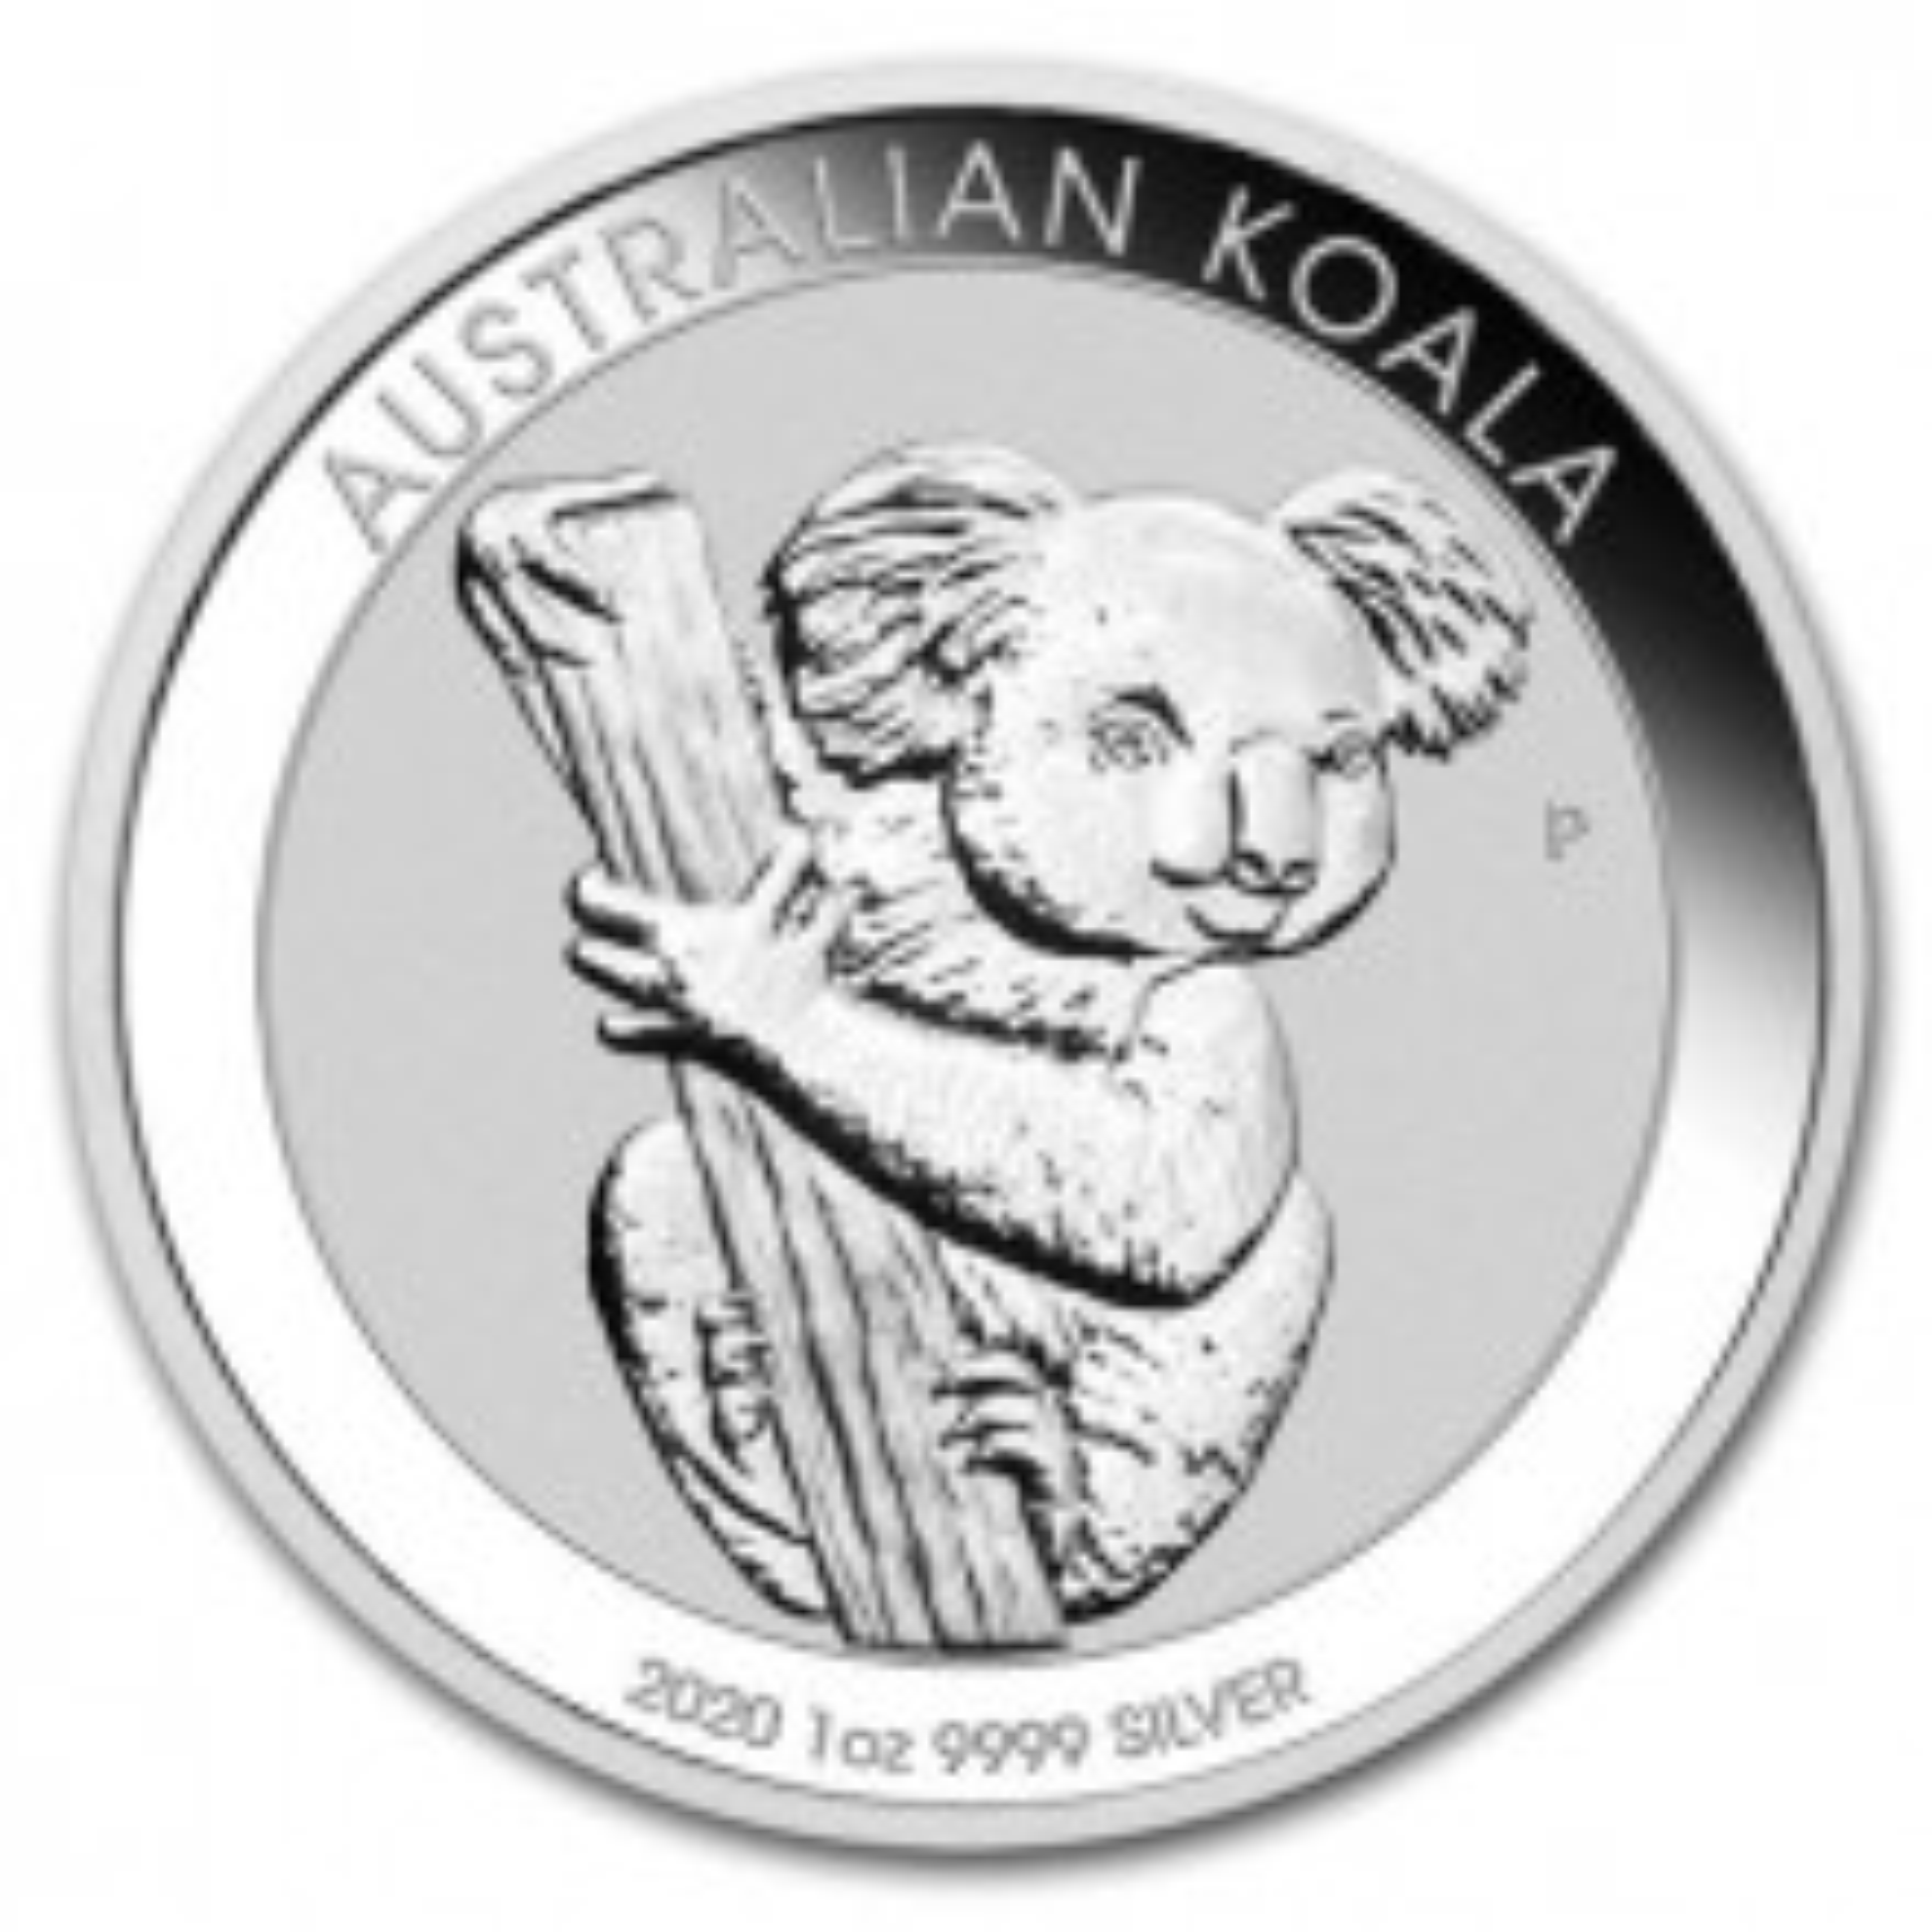 1 Troy ounce silver coin Koala 2020